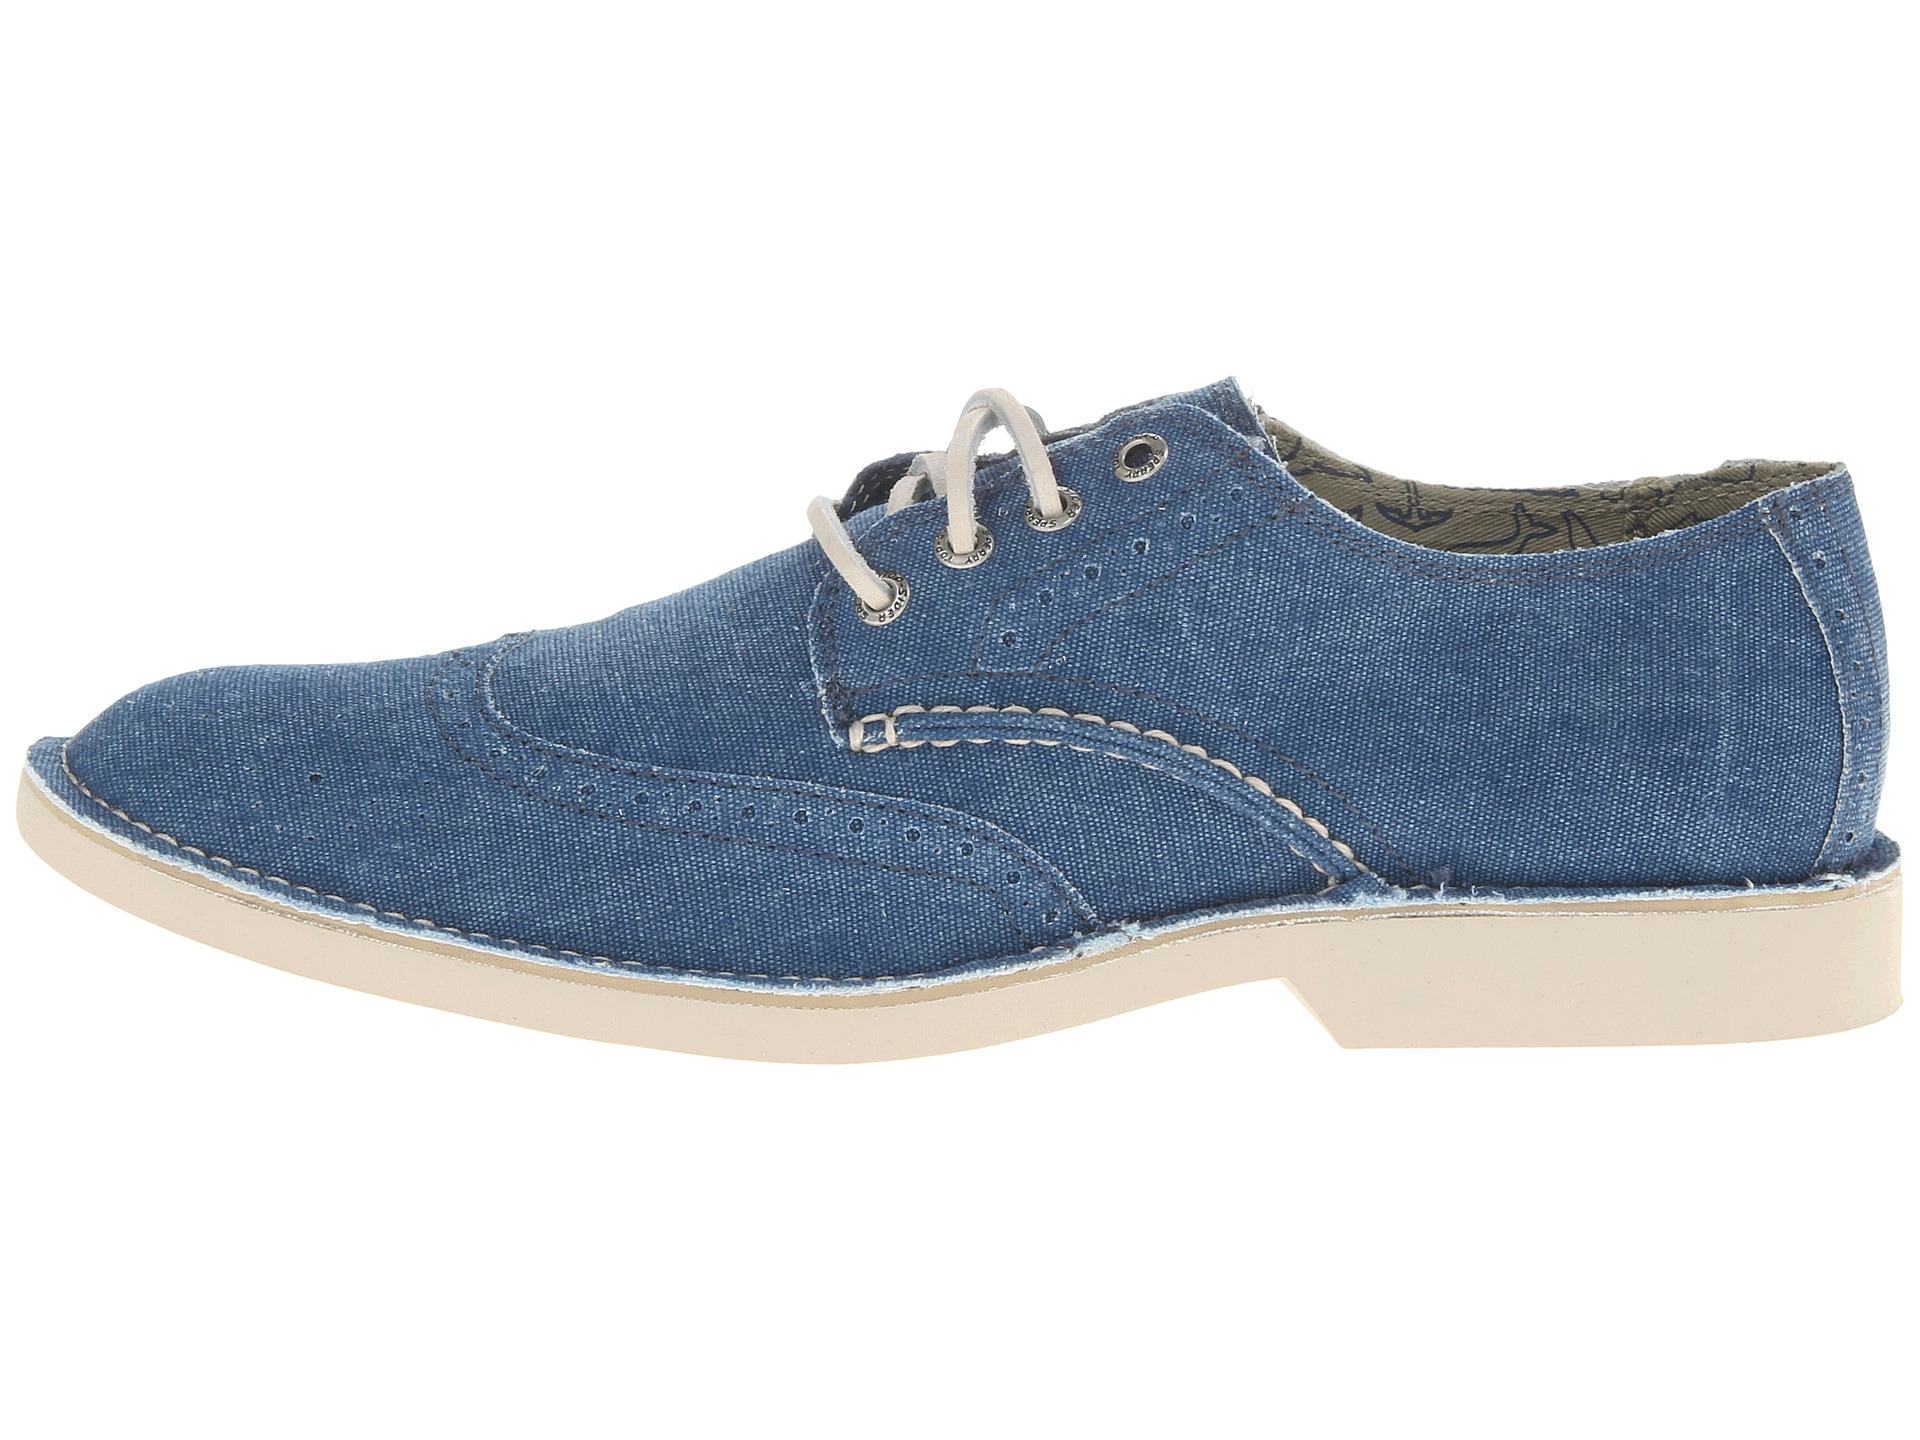 Sperry Ellis Top Sider Shoes